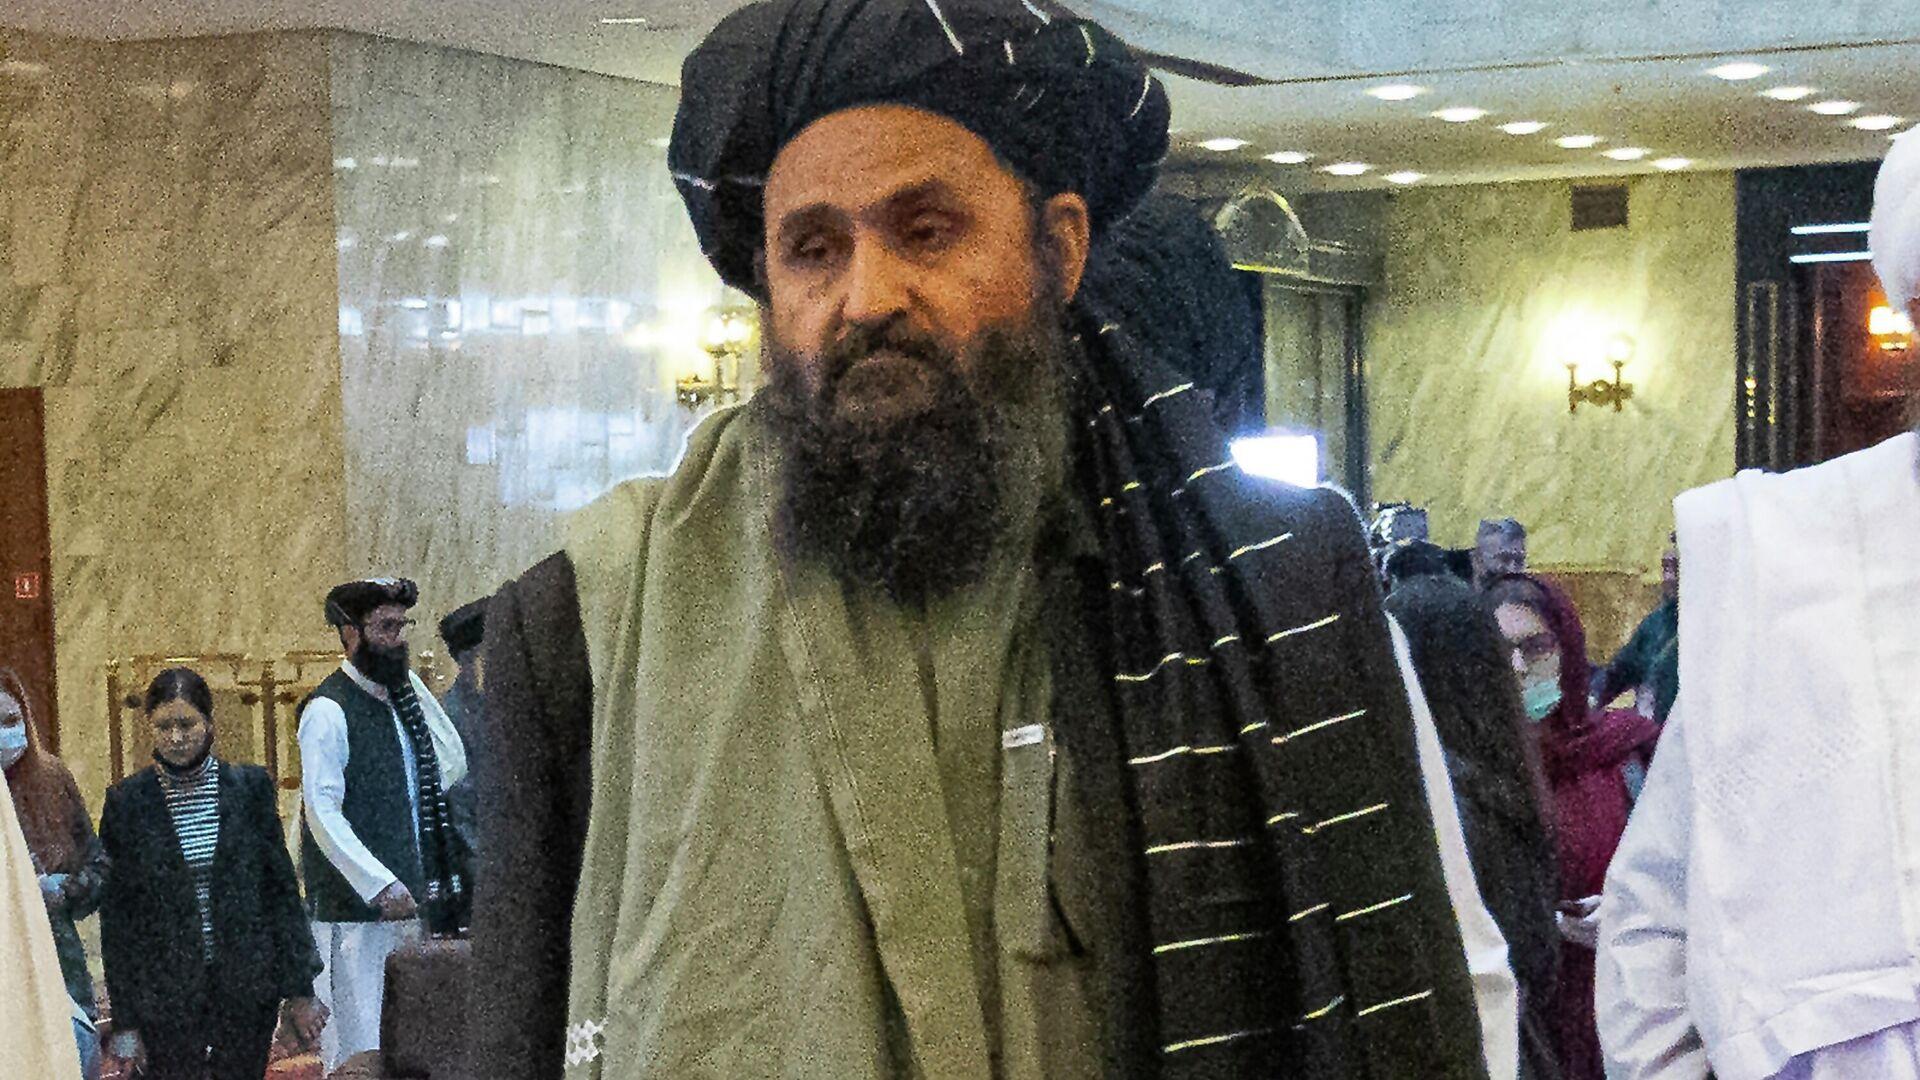 I.o. zamglavы sformirovannogo dvijeniyem Taliban* pravitelstva Afganistana Abdul Gani Baradar - Sputnik Oʻzbekiston, 1920, 26.09.2021